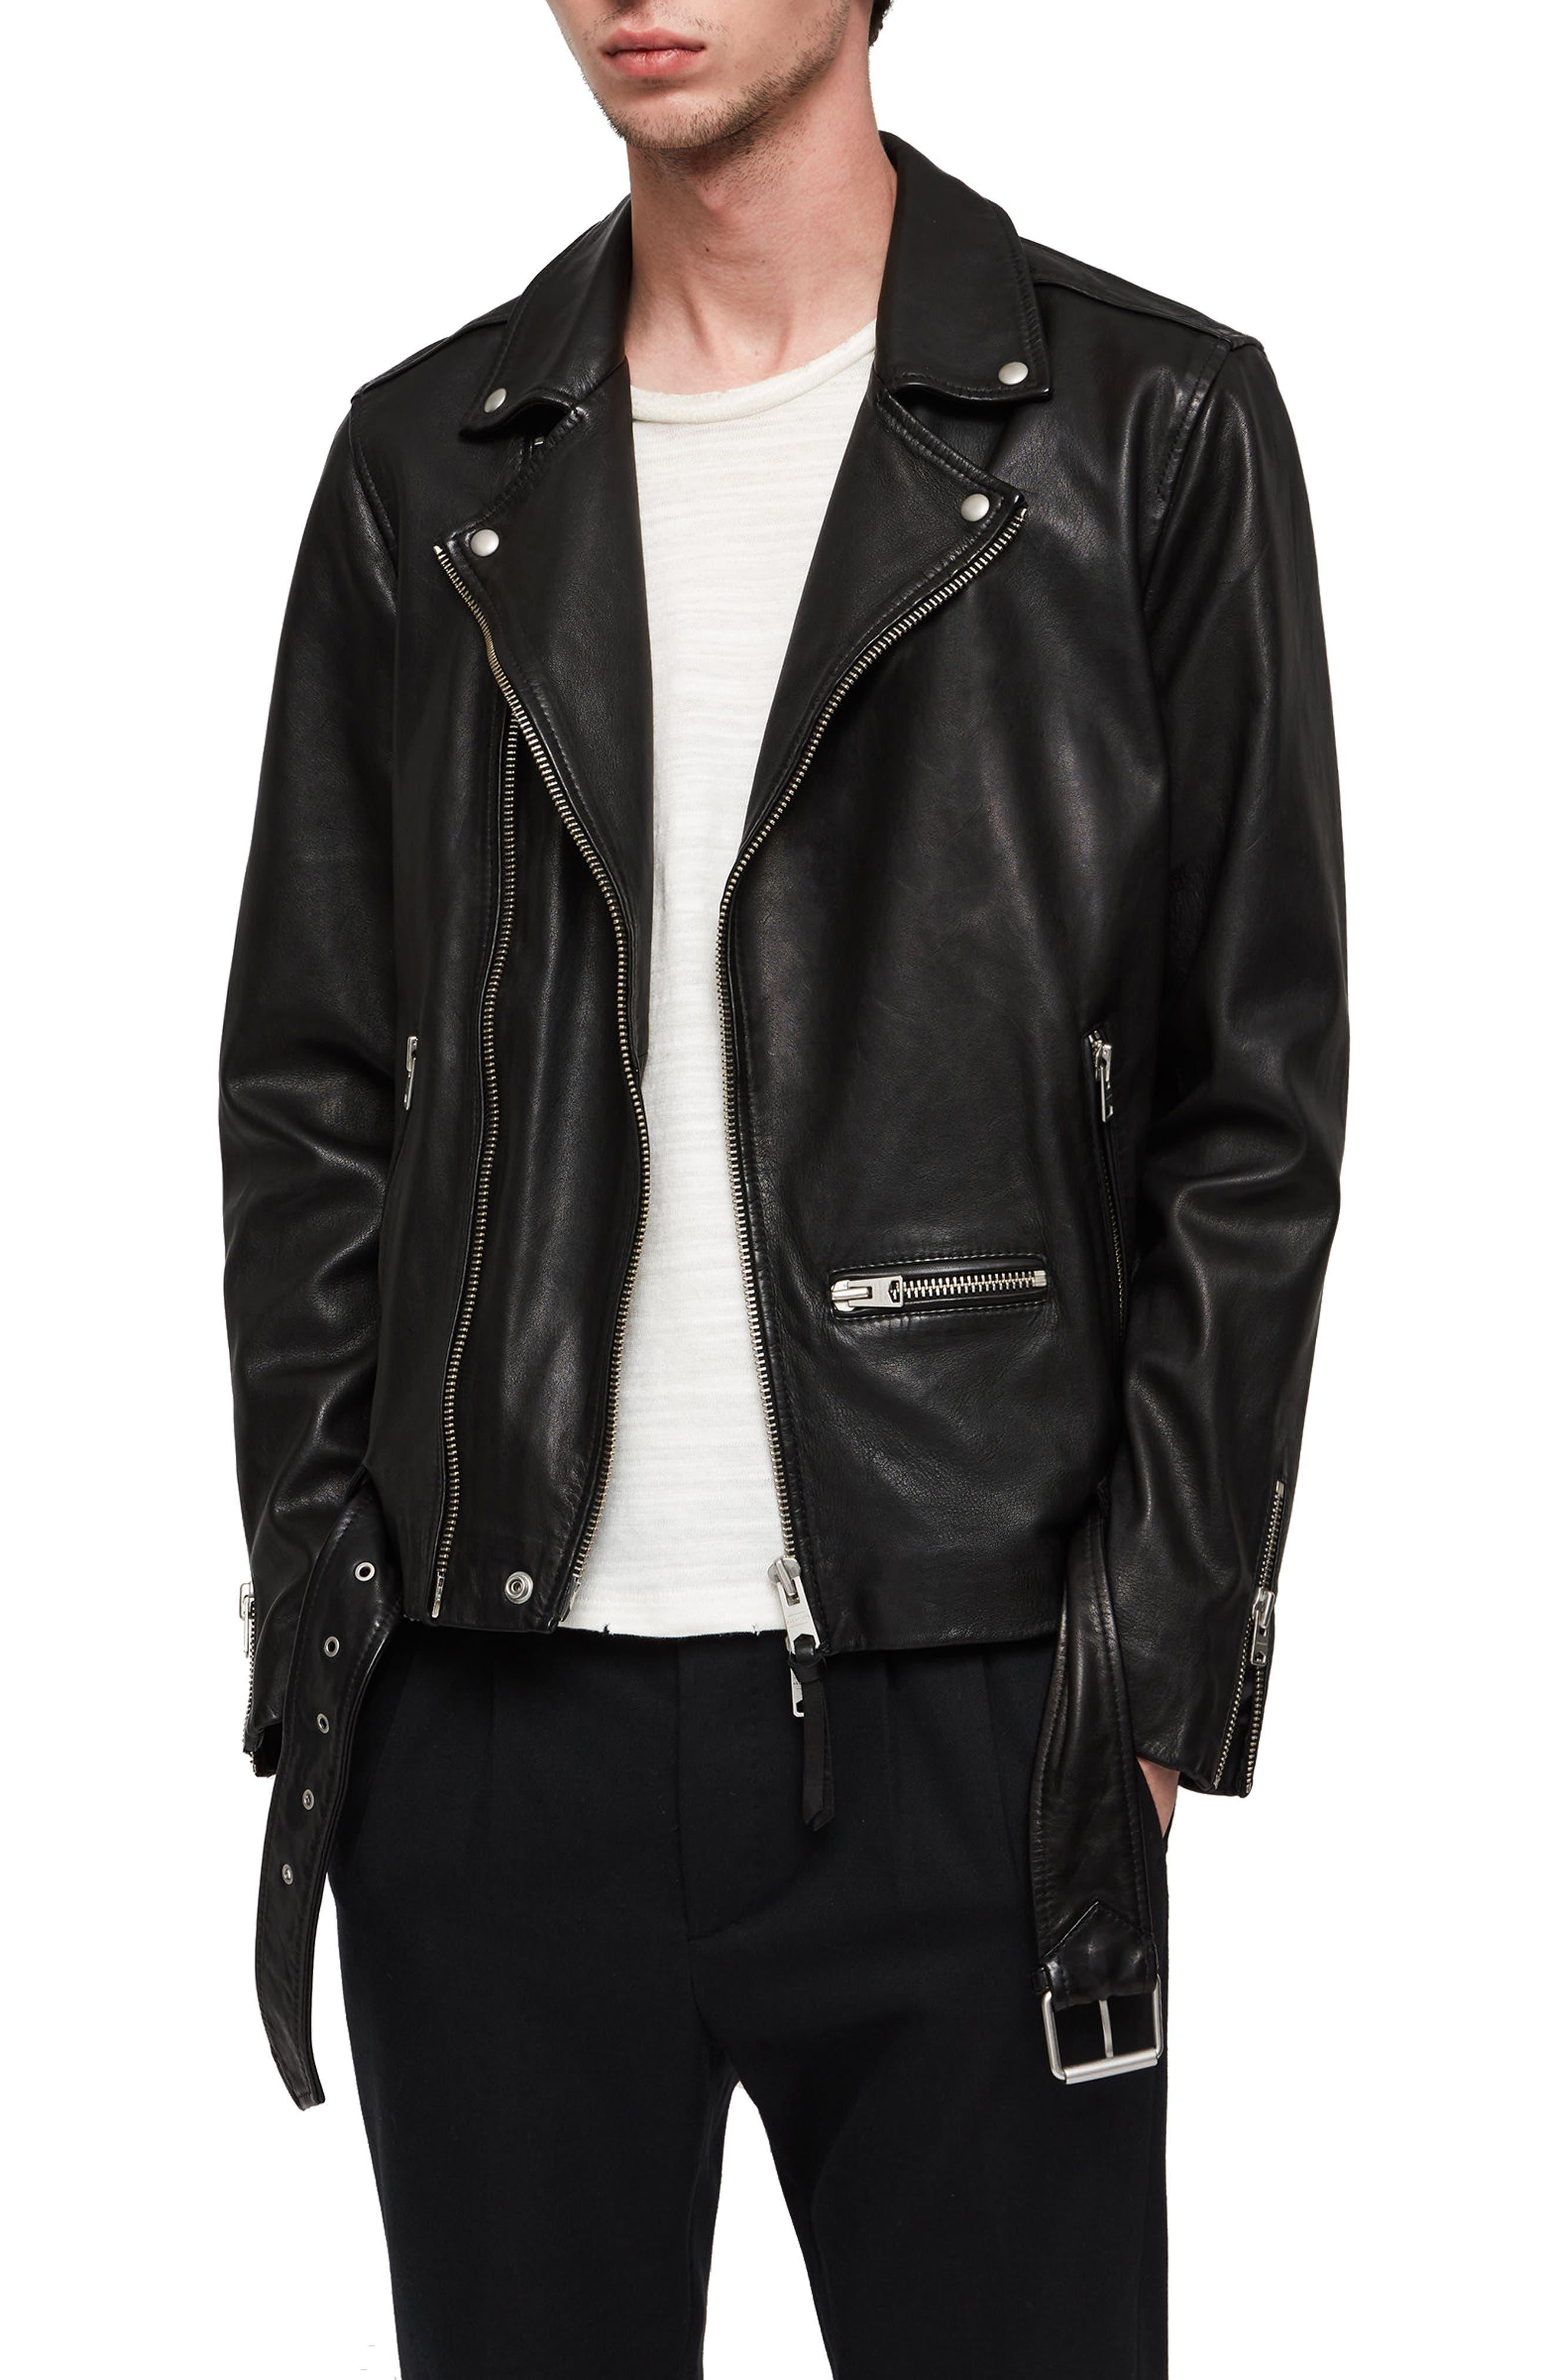 Wick Slim Fit Leather Biker Jacket,                             Main thumbnail 1, color,                             BLACK